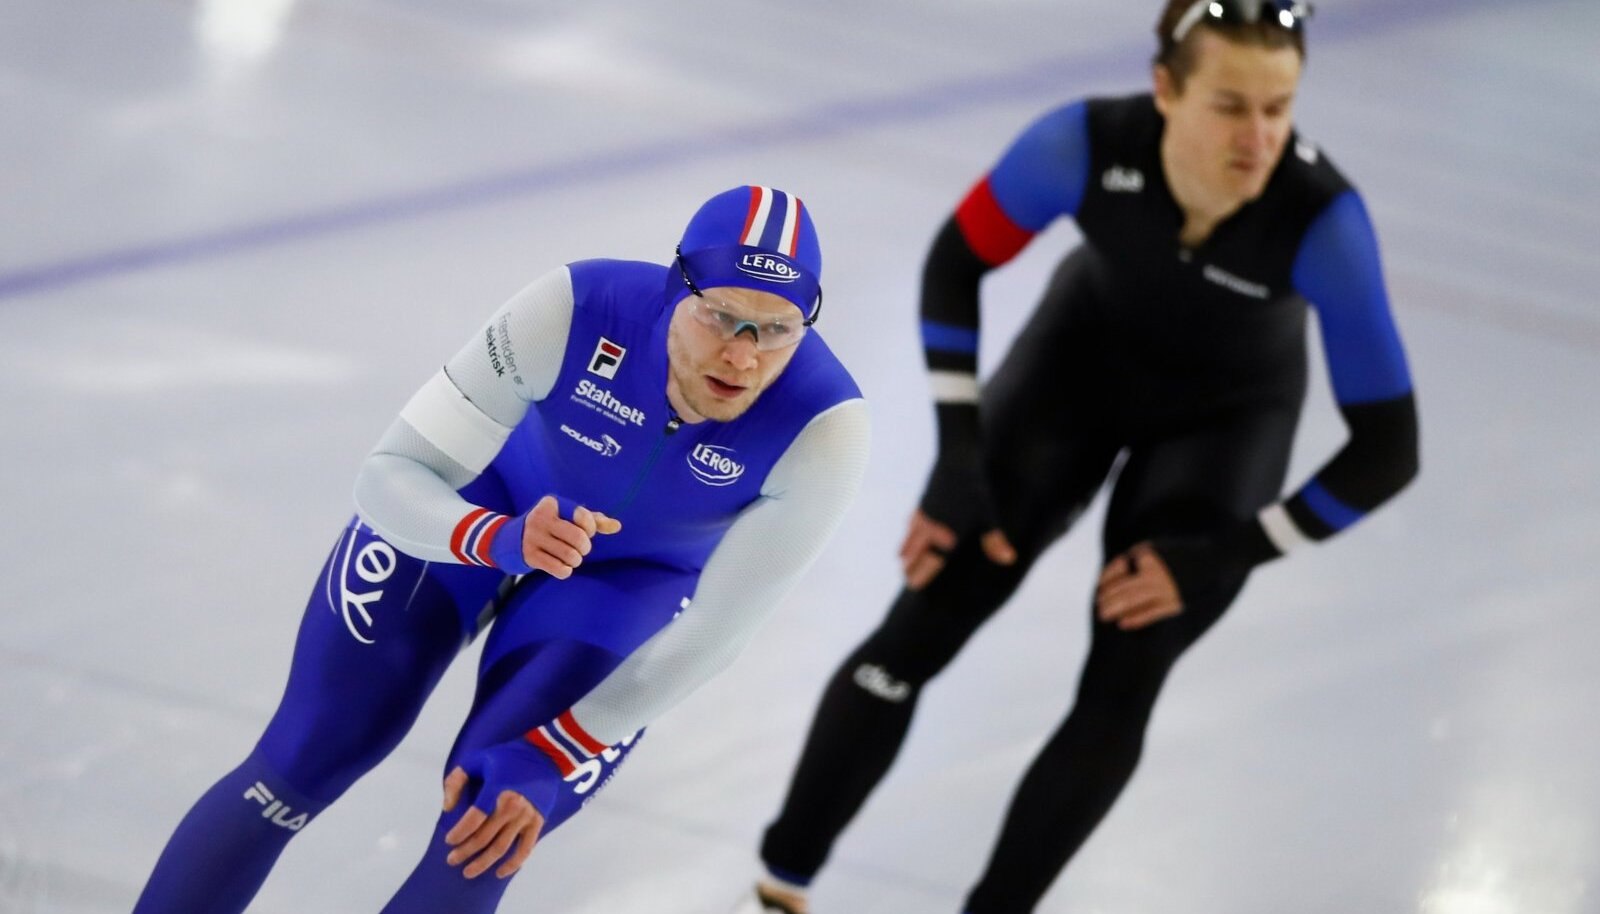 Marten Liiv (paremal) Heerenveeni MM-i 1000 m distantsi finišis koos norralase Havard Holmefjord Lorentzeniga.